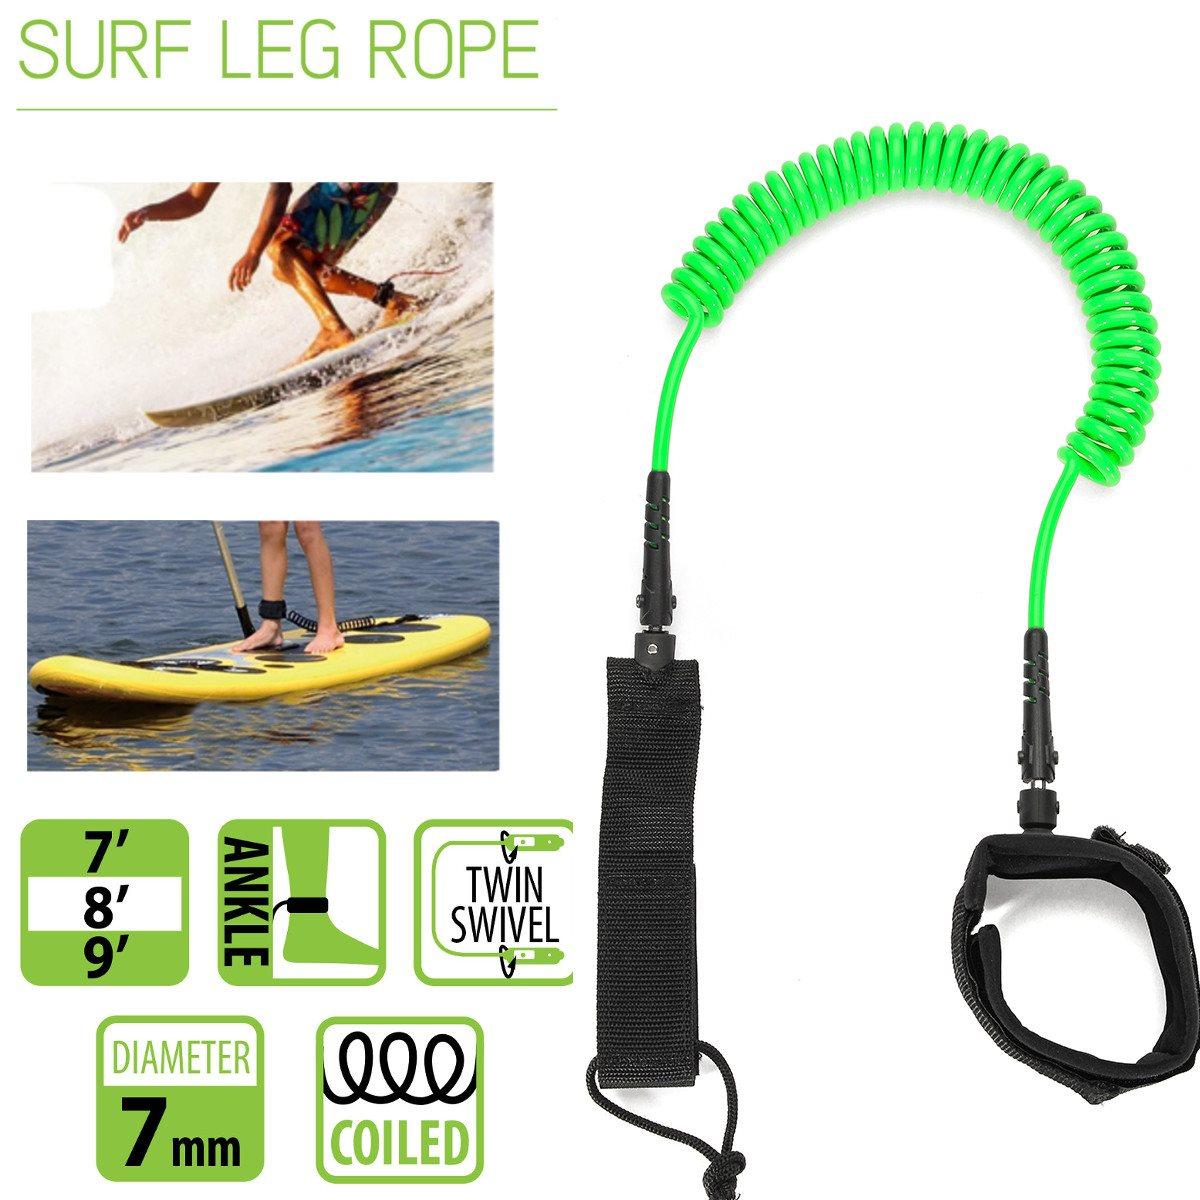 6bbbc3c24 10ft 7mm Tornozelo Enrolada Leash Prancha SUP Stand UP paddle board Paddle  Board TPU corda acessório de surf